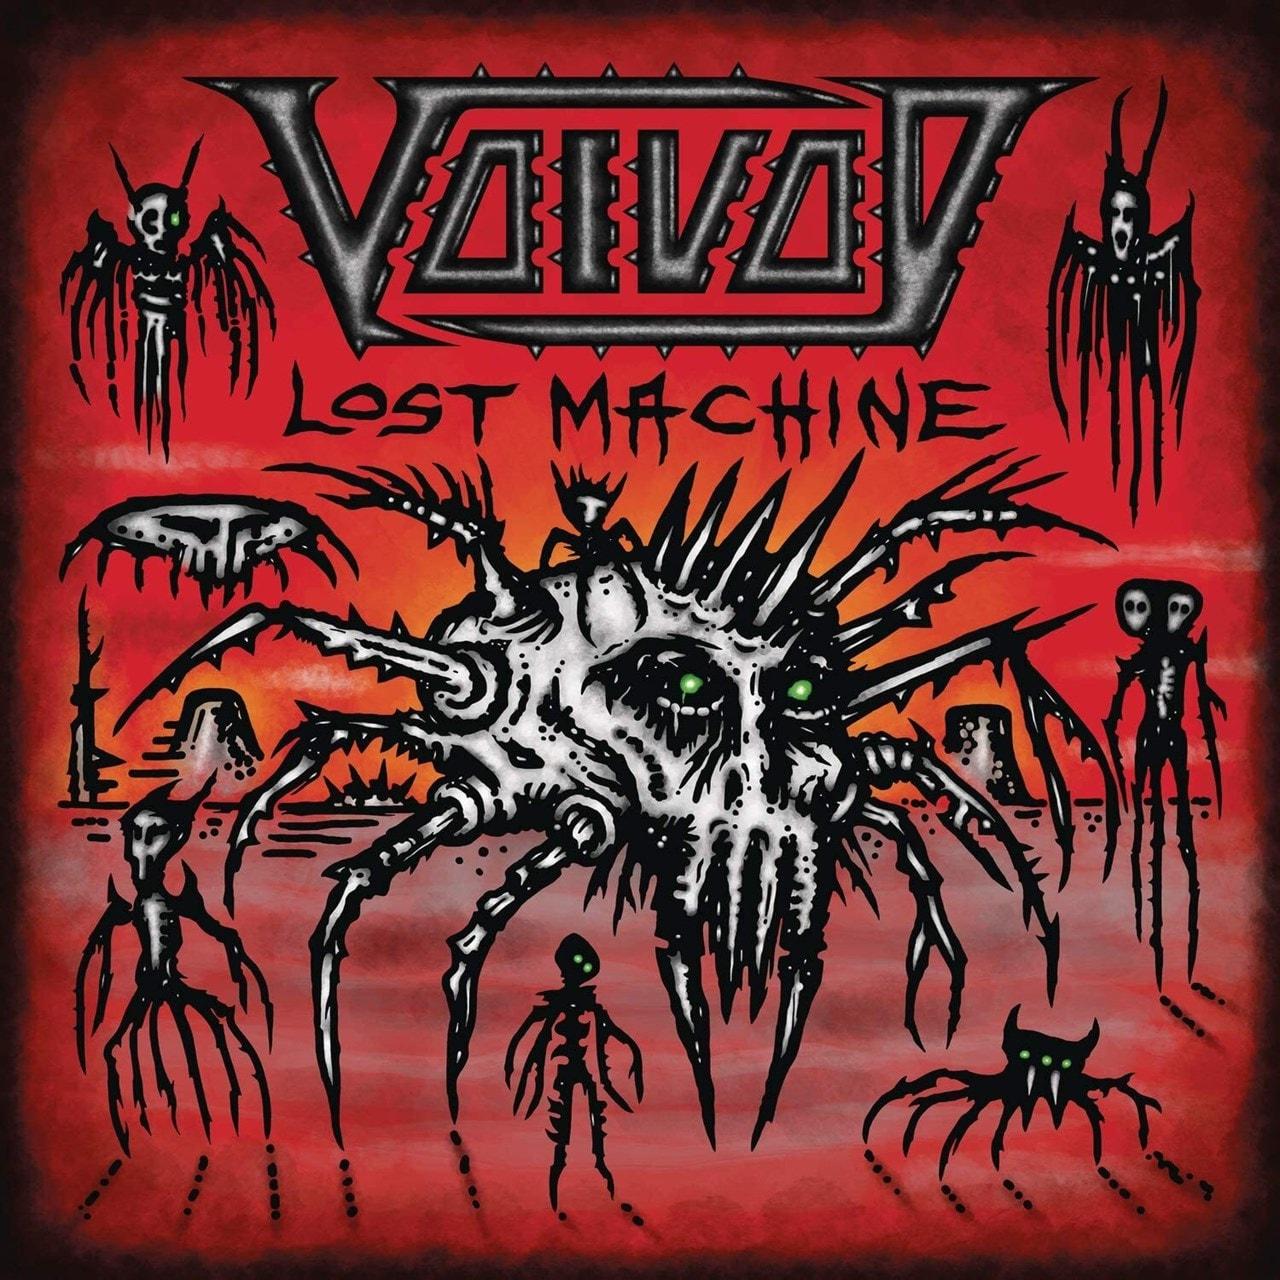 Lost Machine - Live - 1